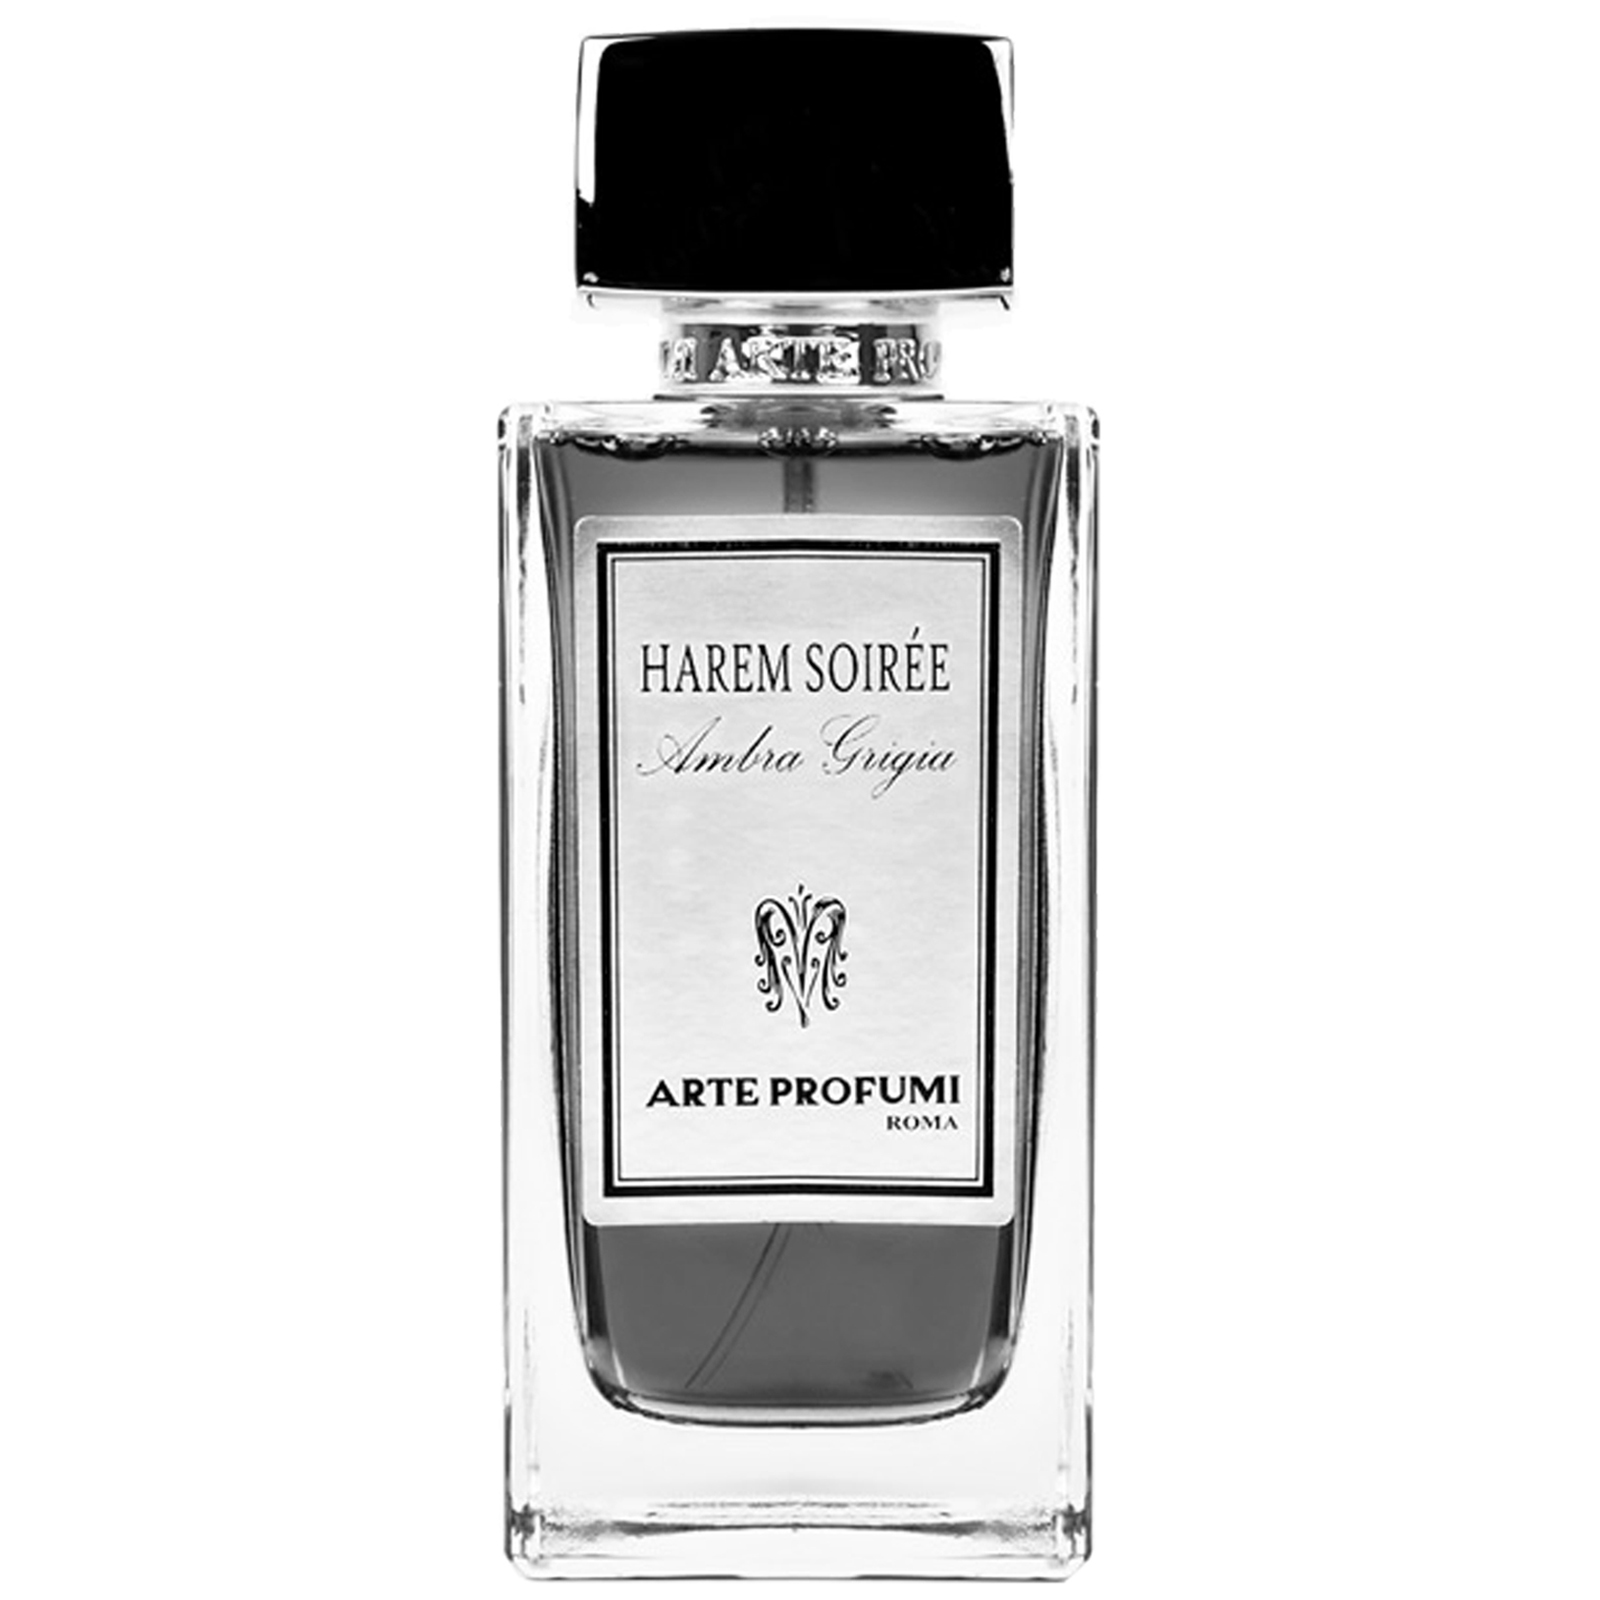 Harem soirée profumo parfum 100 ml